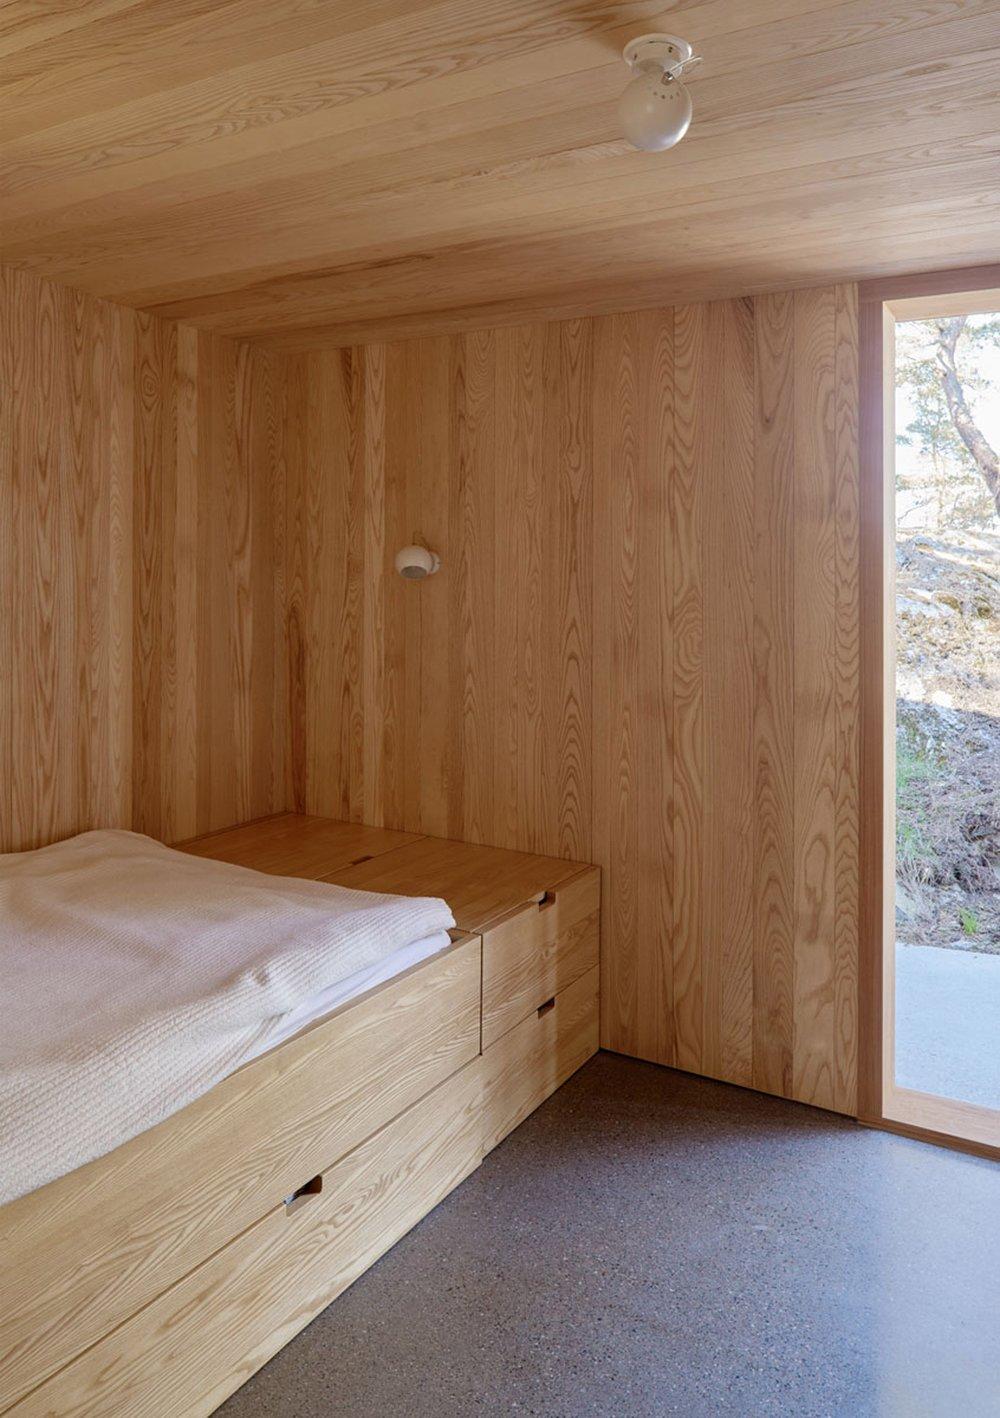 krokholmen-house-tham-videgard-architecture_dezeen_2364_col_10.jpg